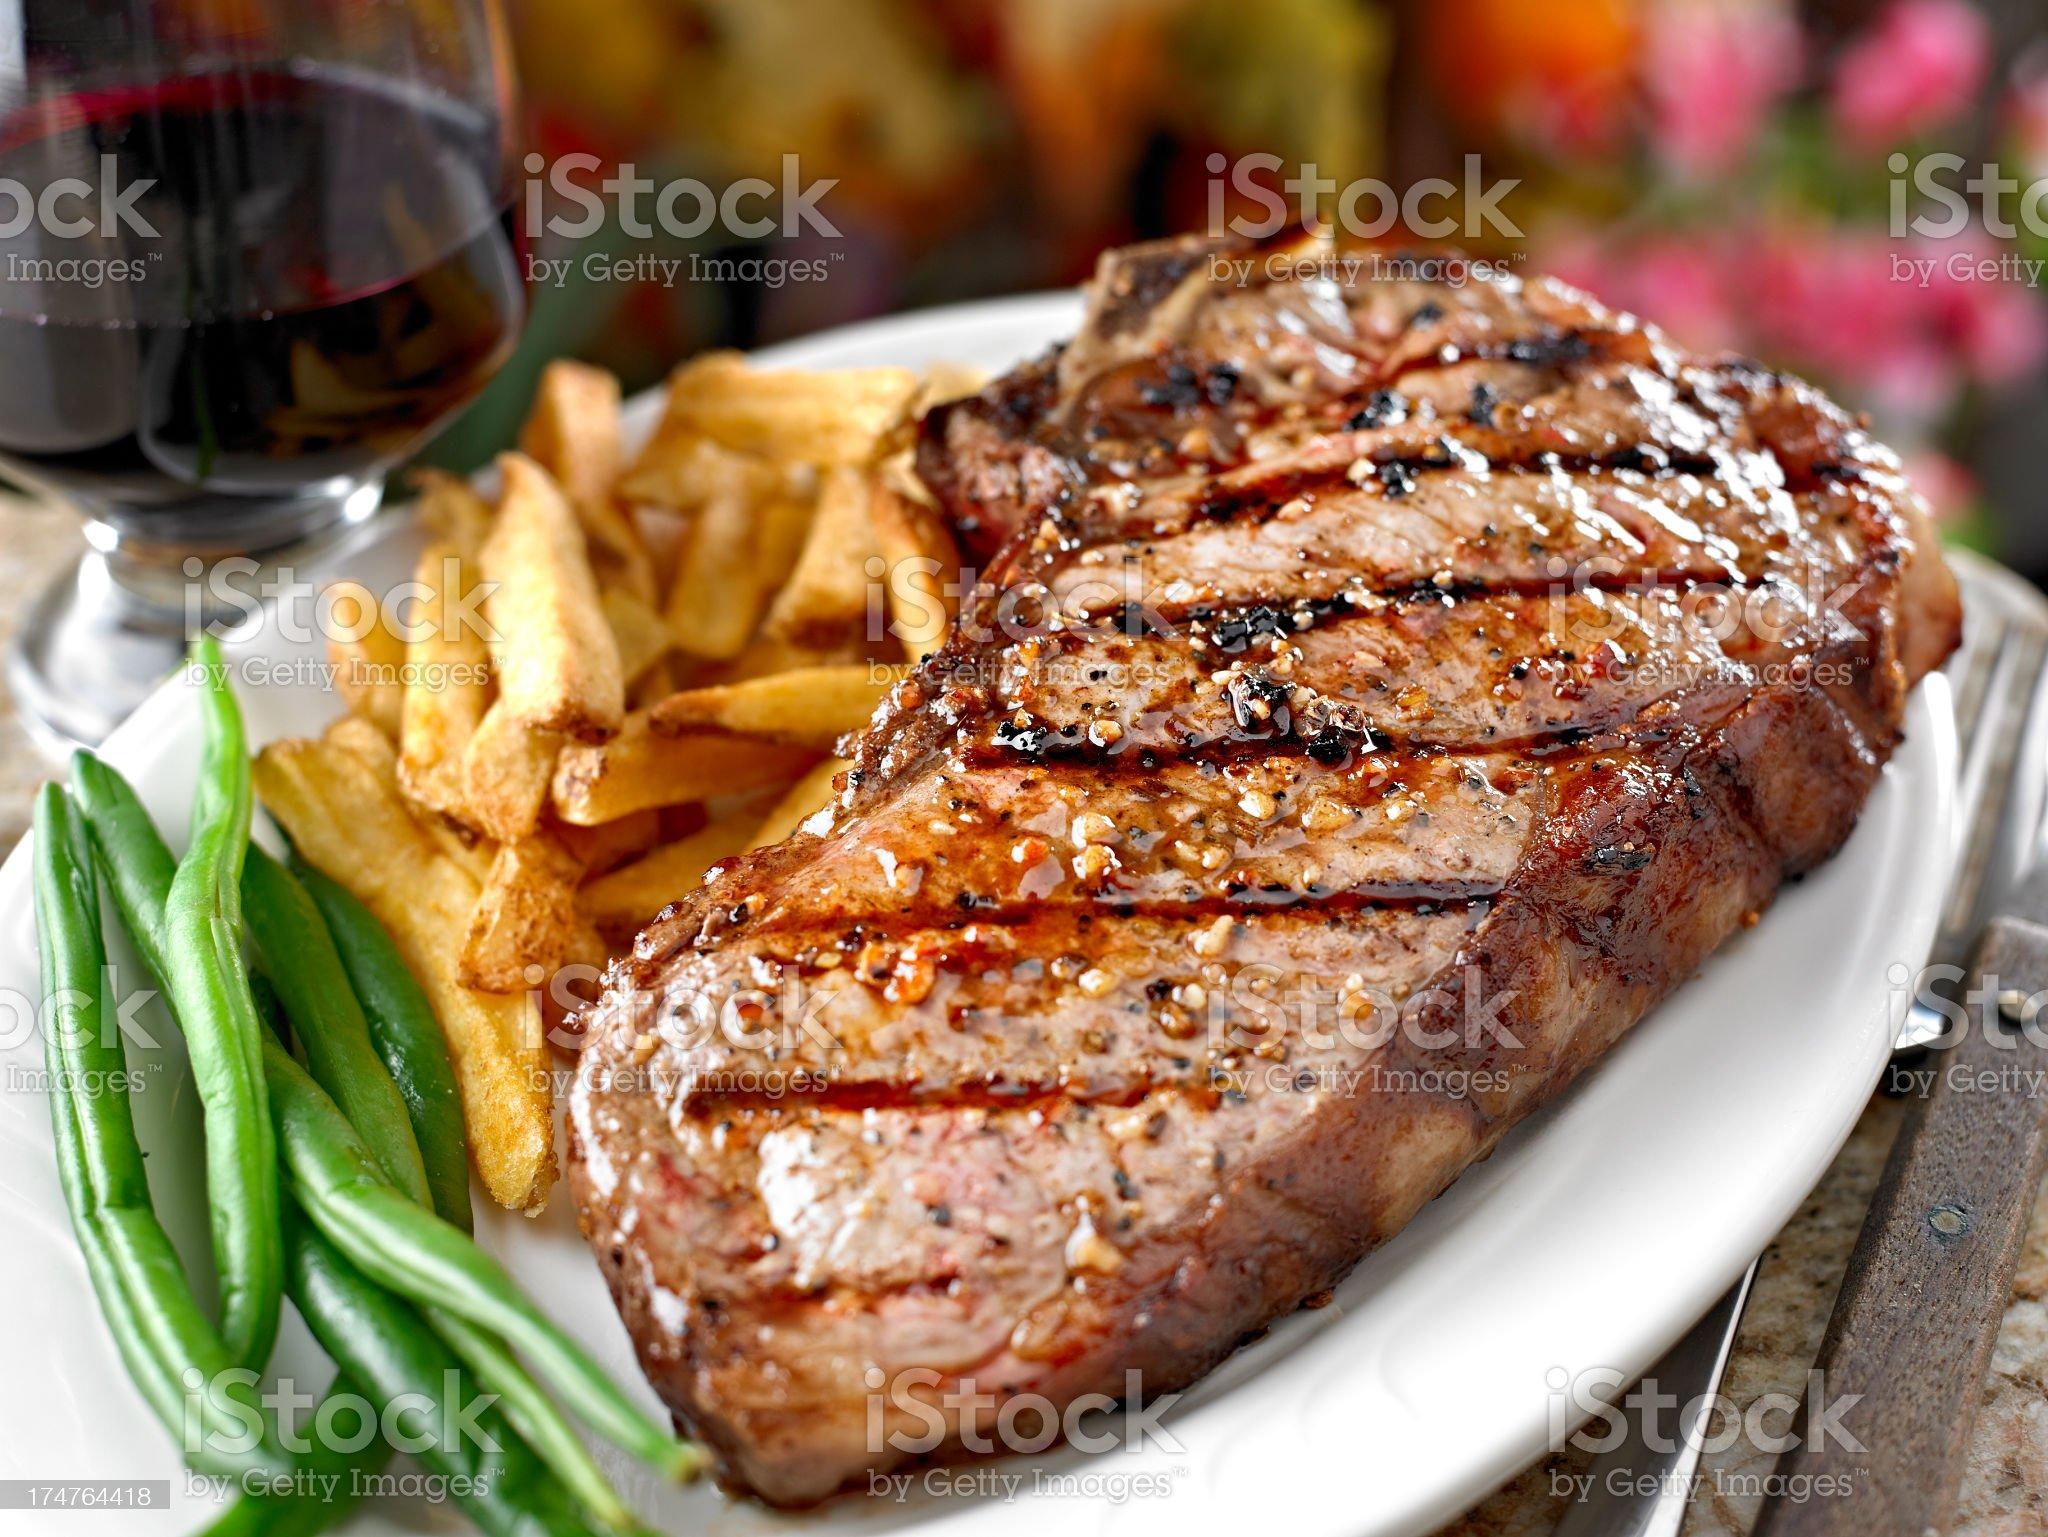 Juicy Grilled Steak royalty-free stock photo